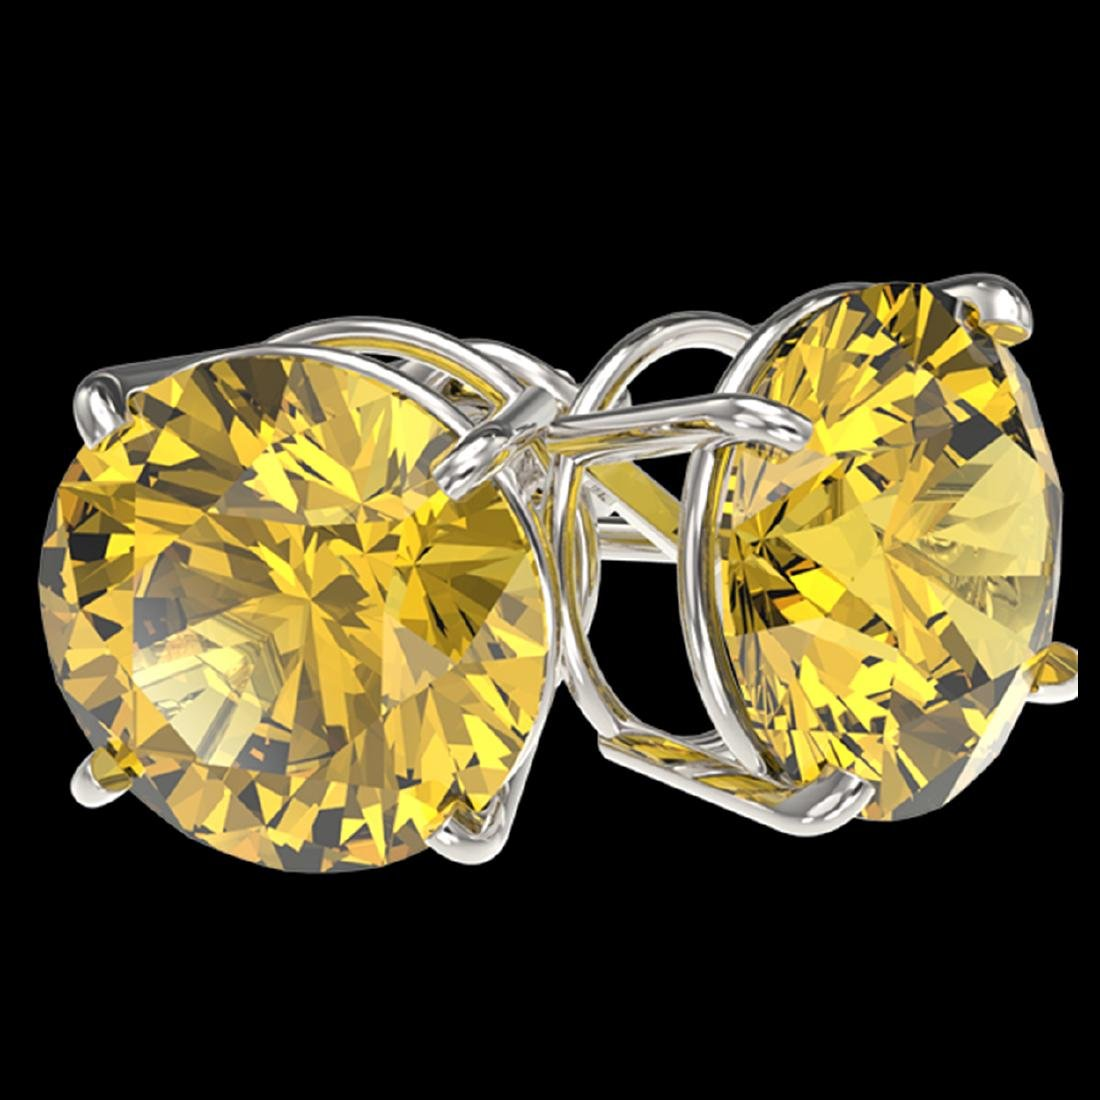 5 ctw Intense Yellow Diamond Stud Earrings 10K White - 3